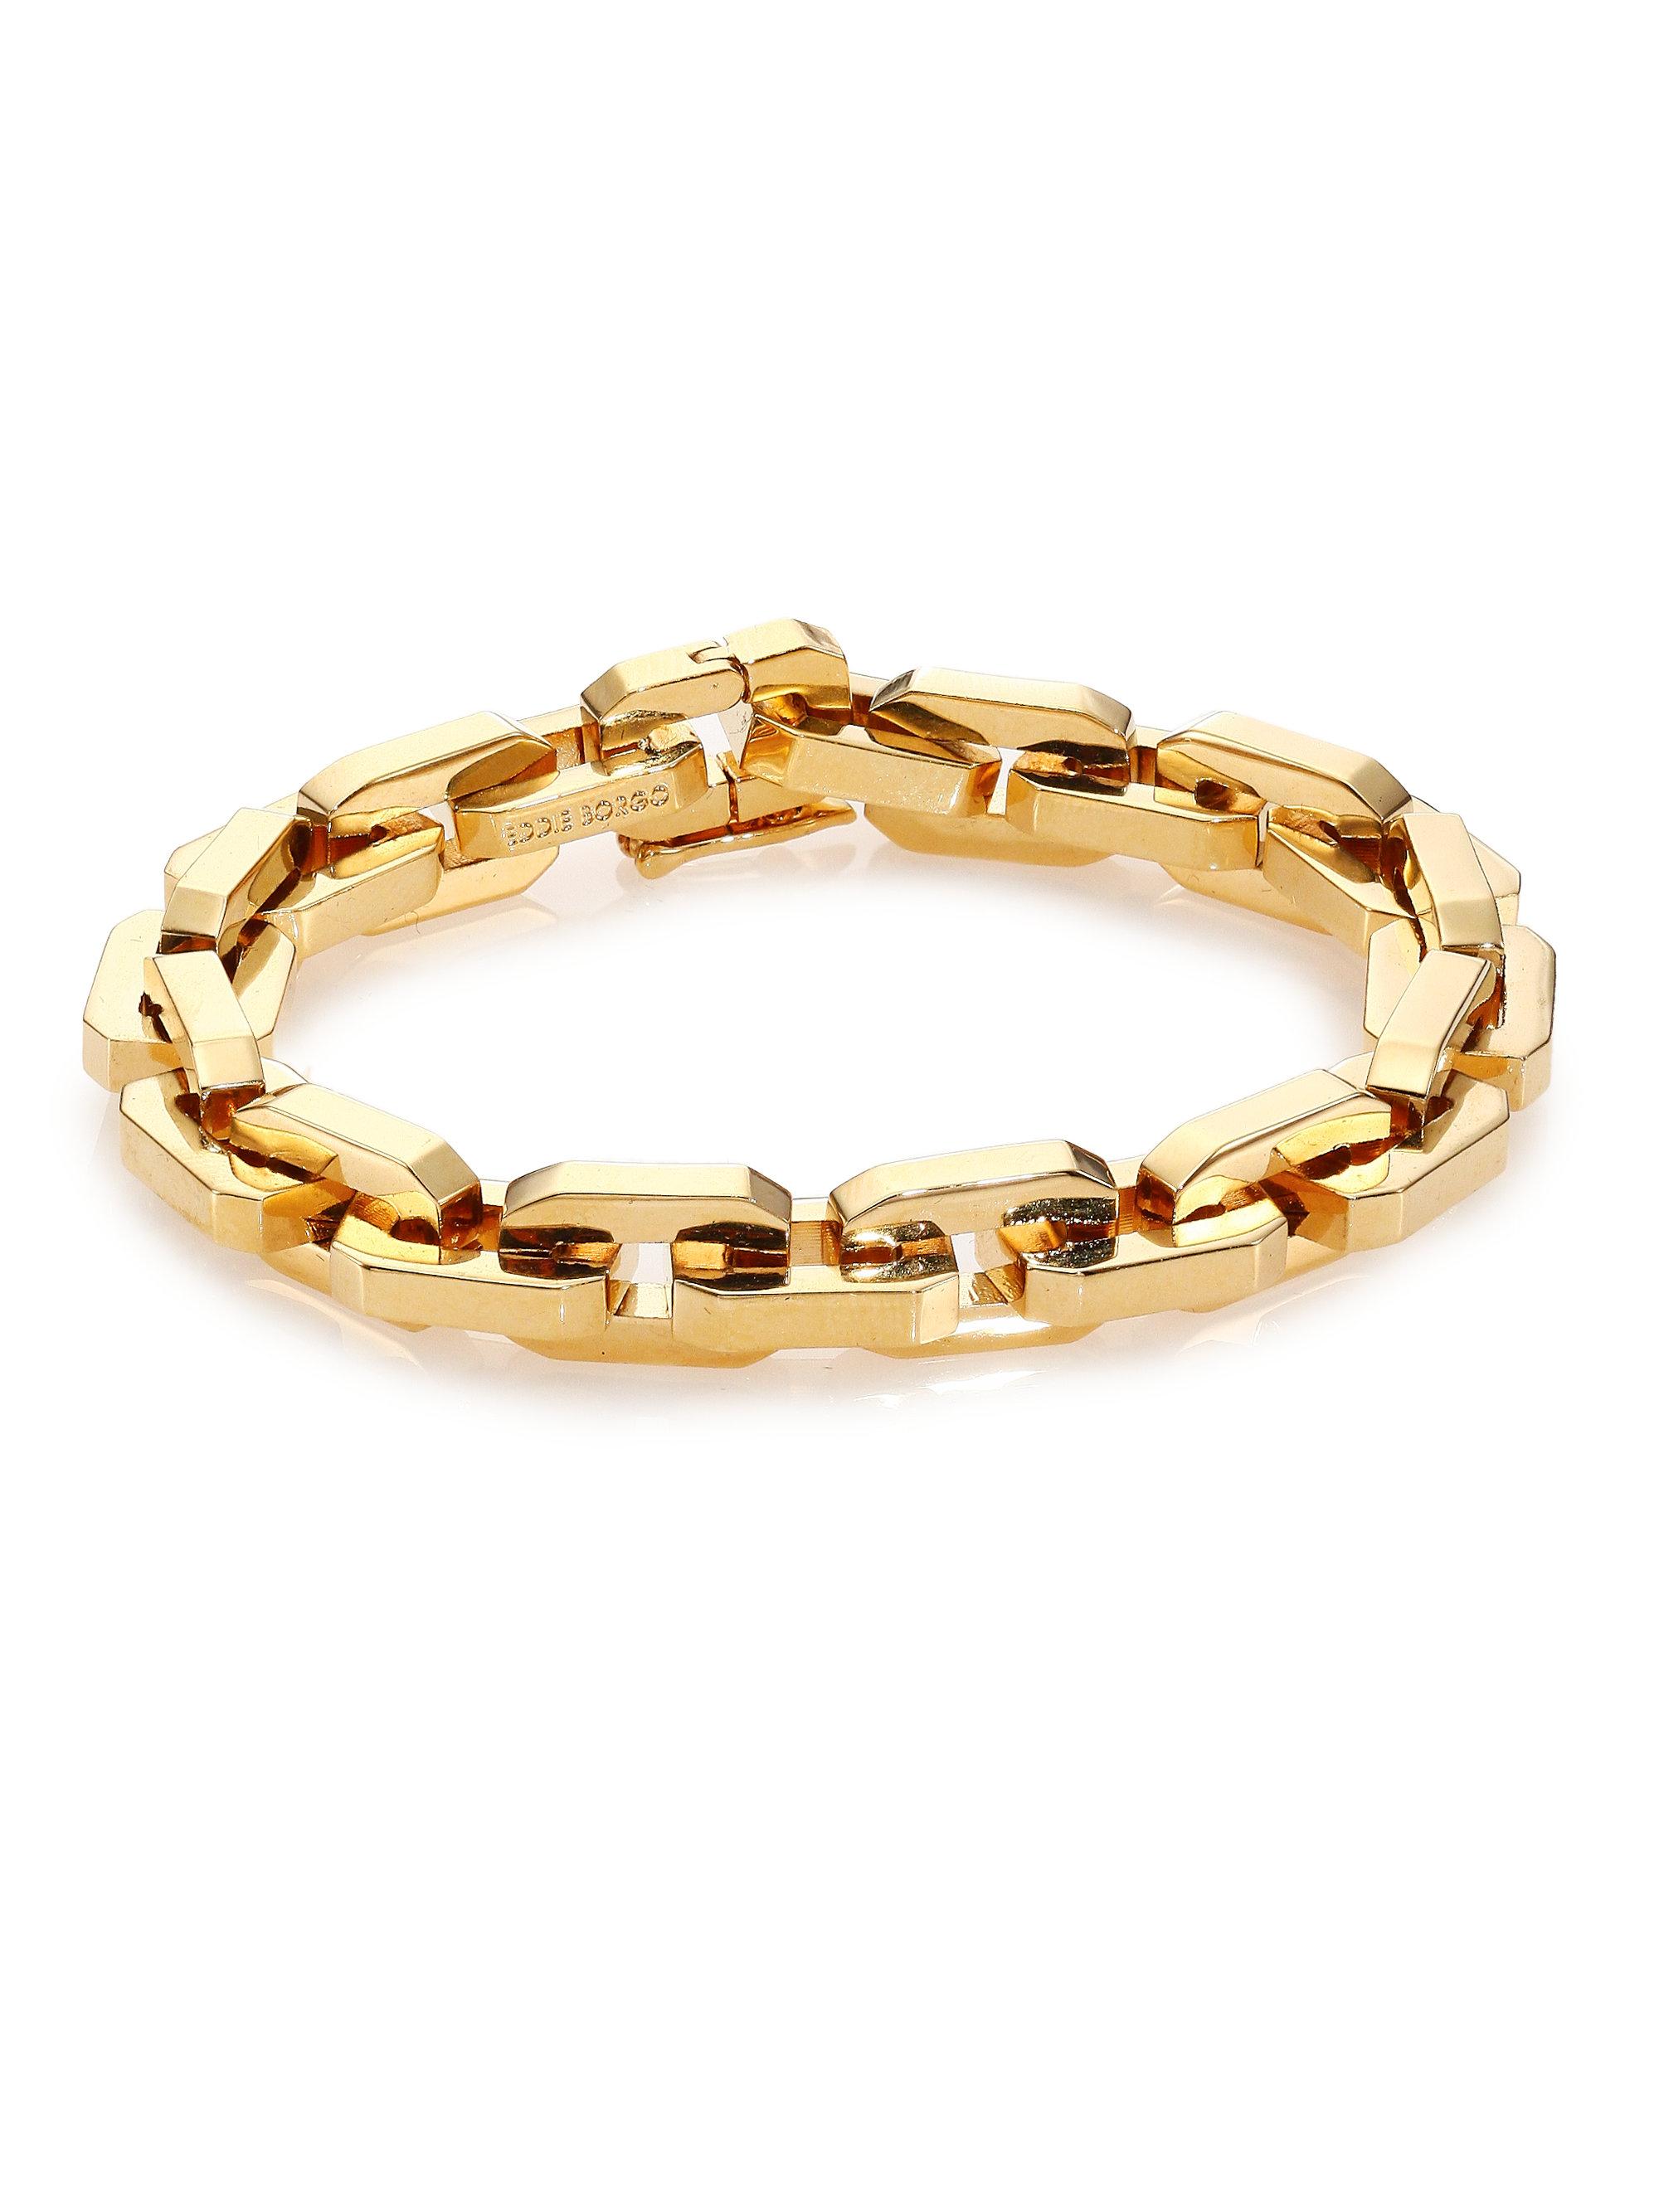 Eddie Borgo Golden cylindrical-link bracelet NI0yb5P